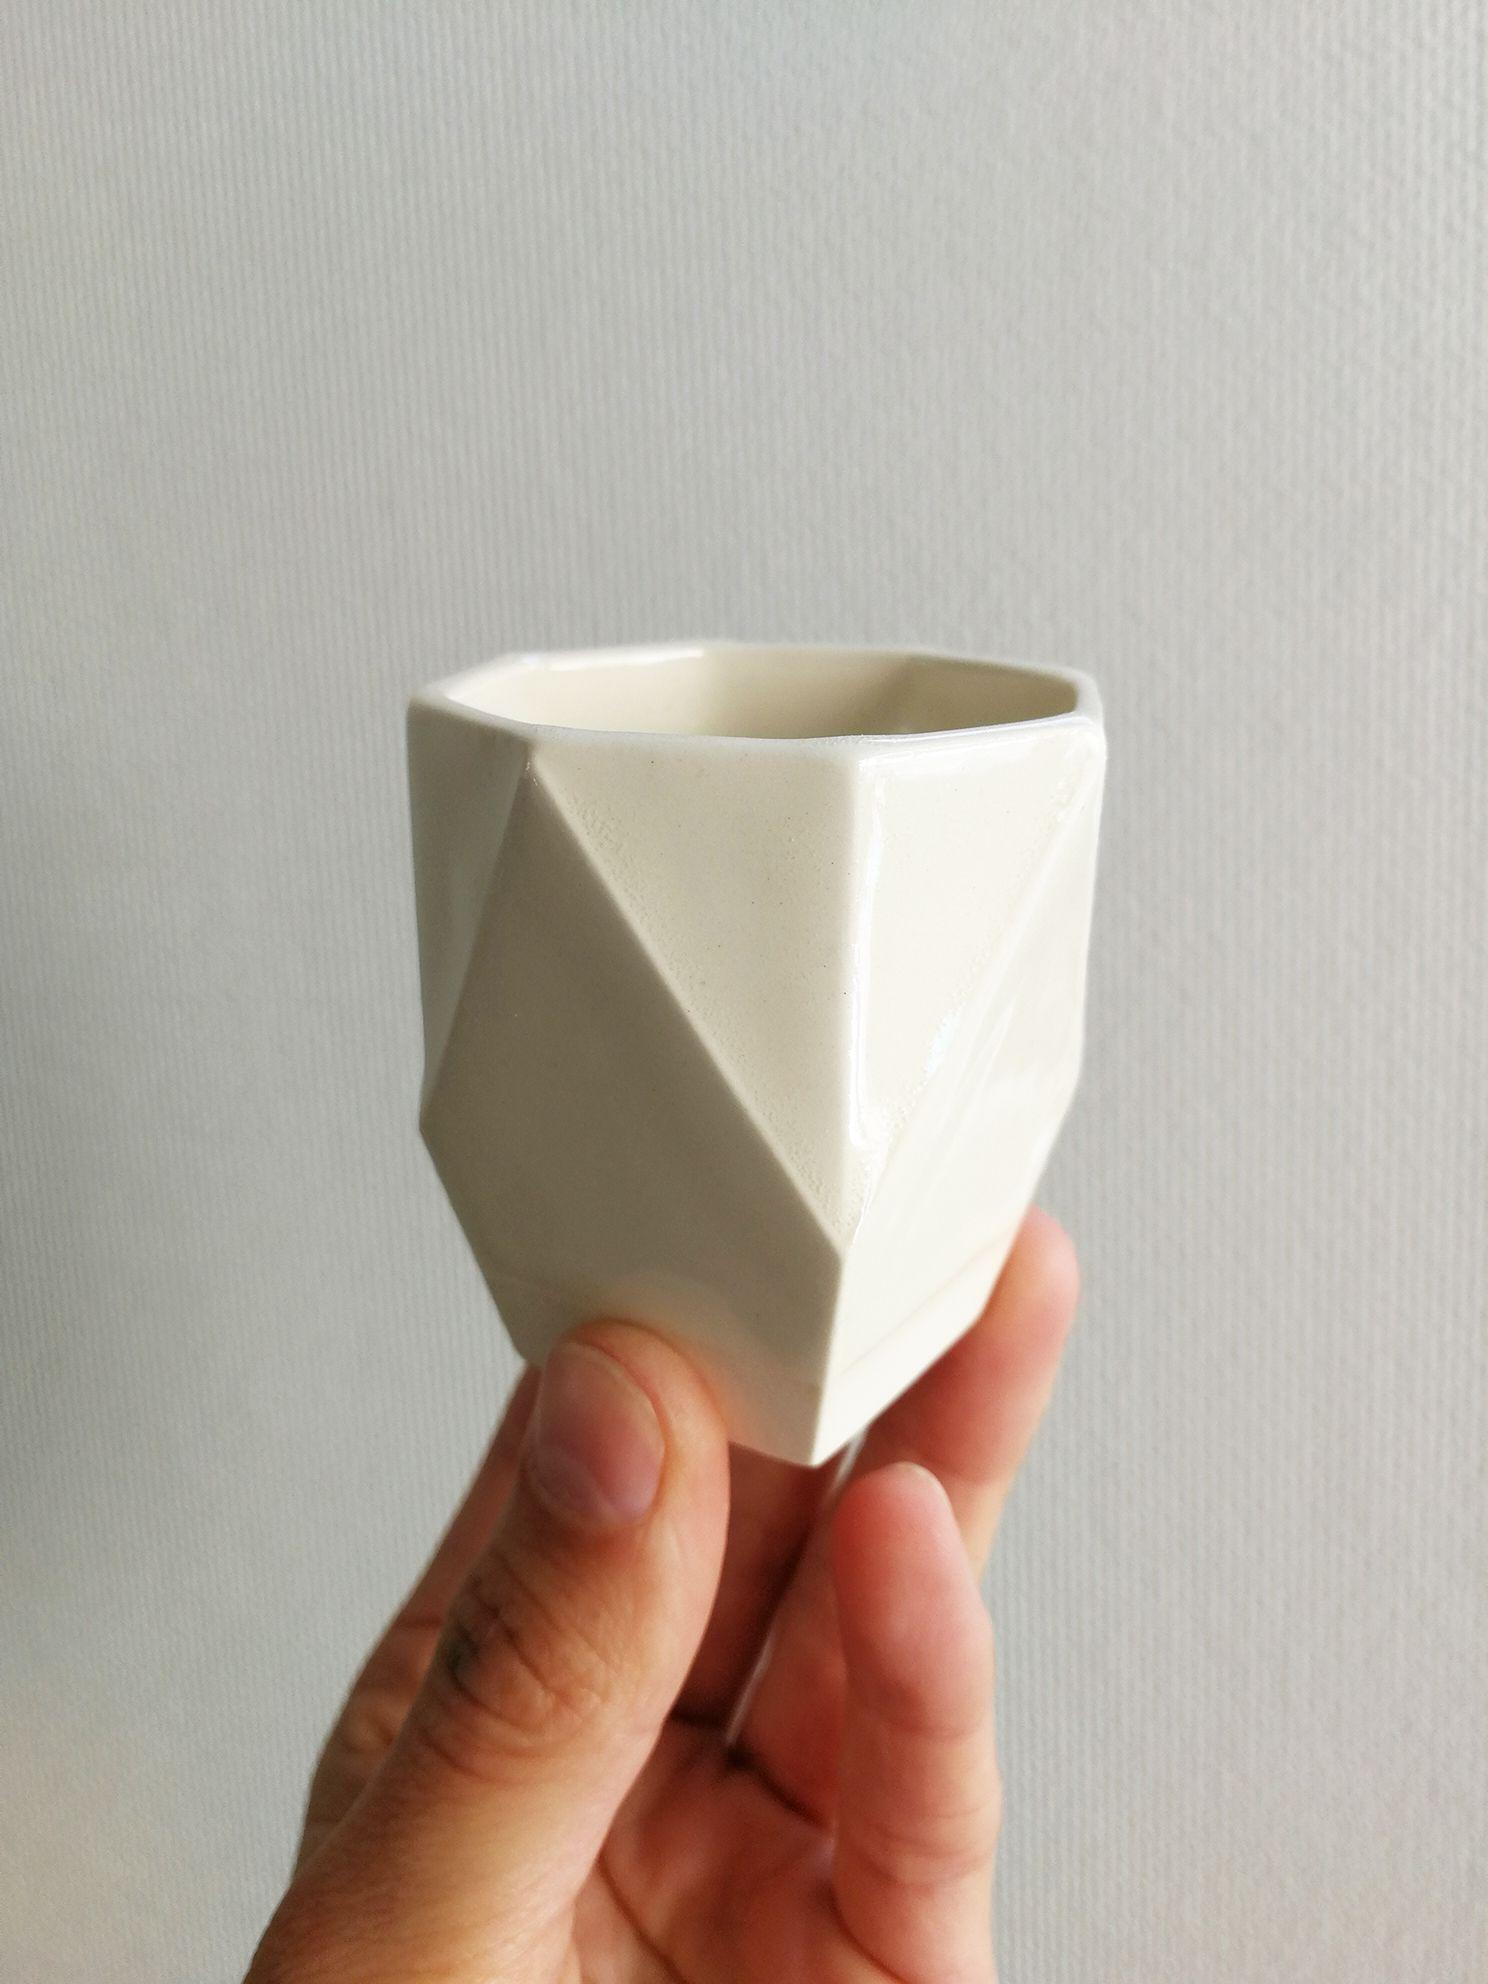 Vaso Hexagonal Ceramica Gres Tamaño Espresso Original Negativo